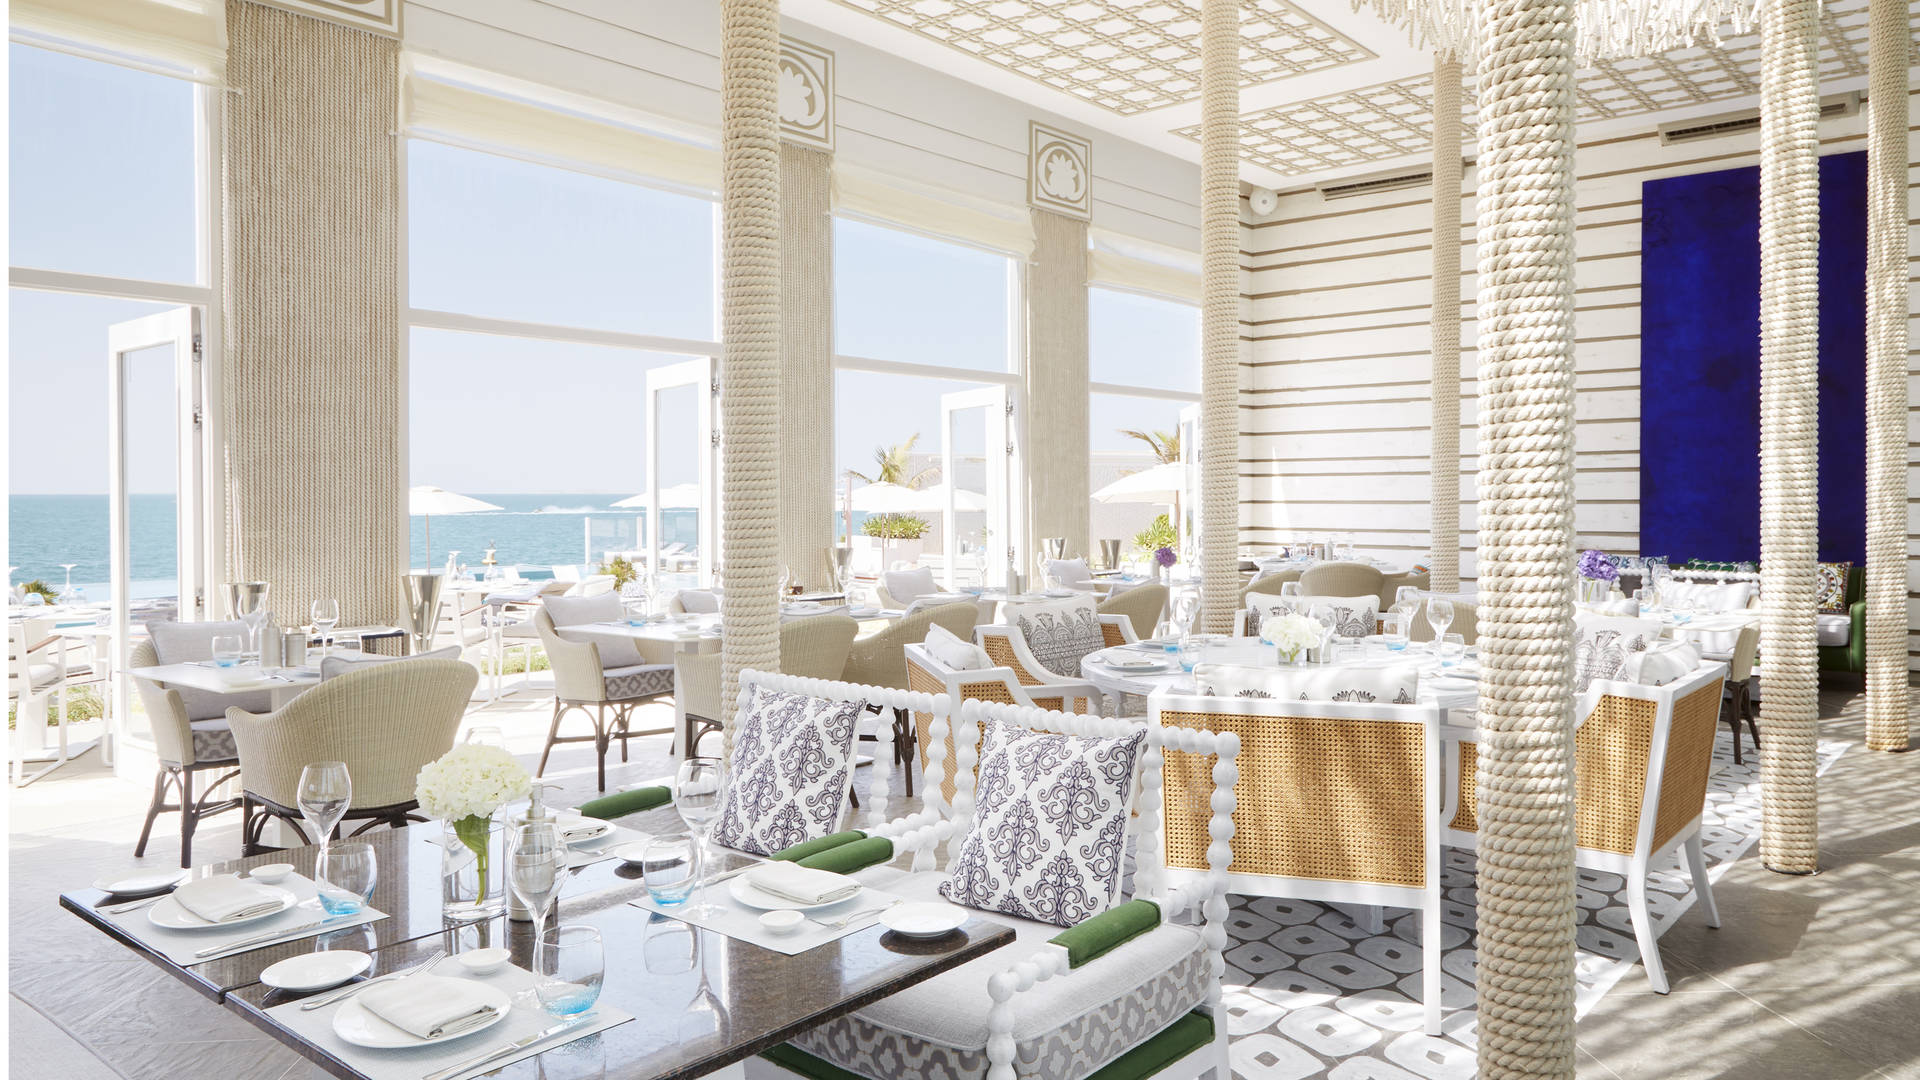 SAL restaurant interiors Dubai